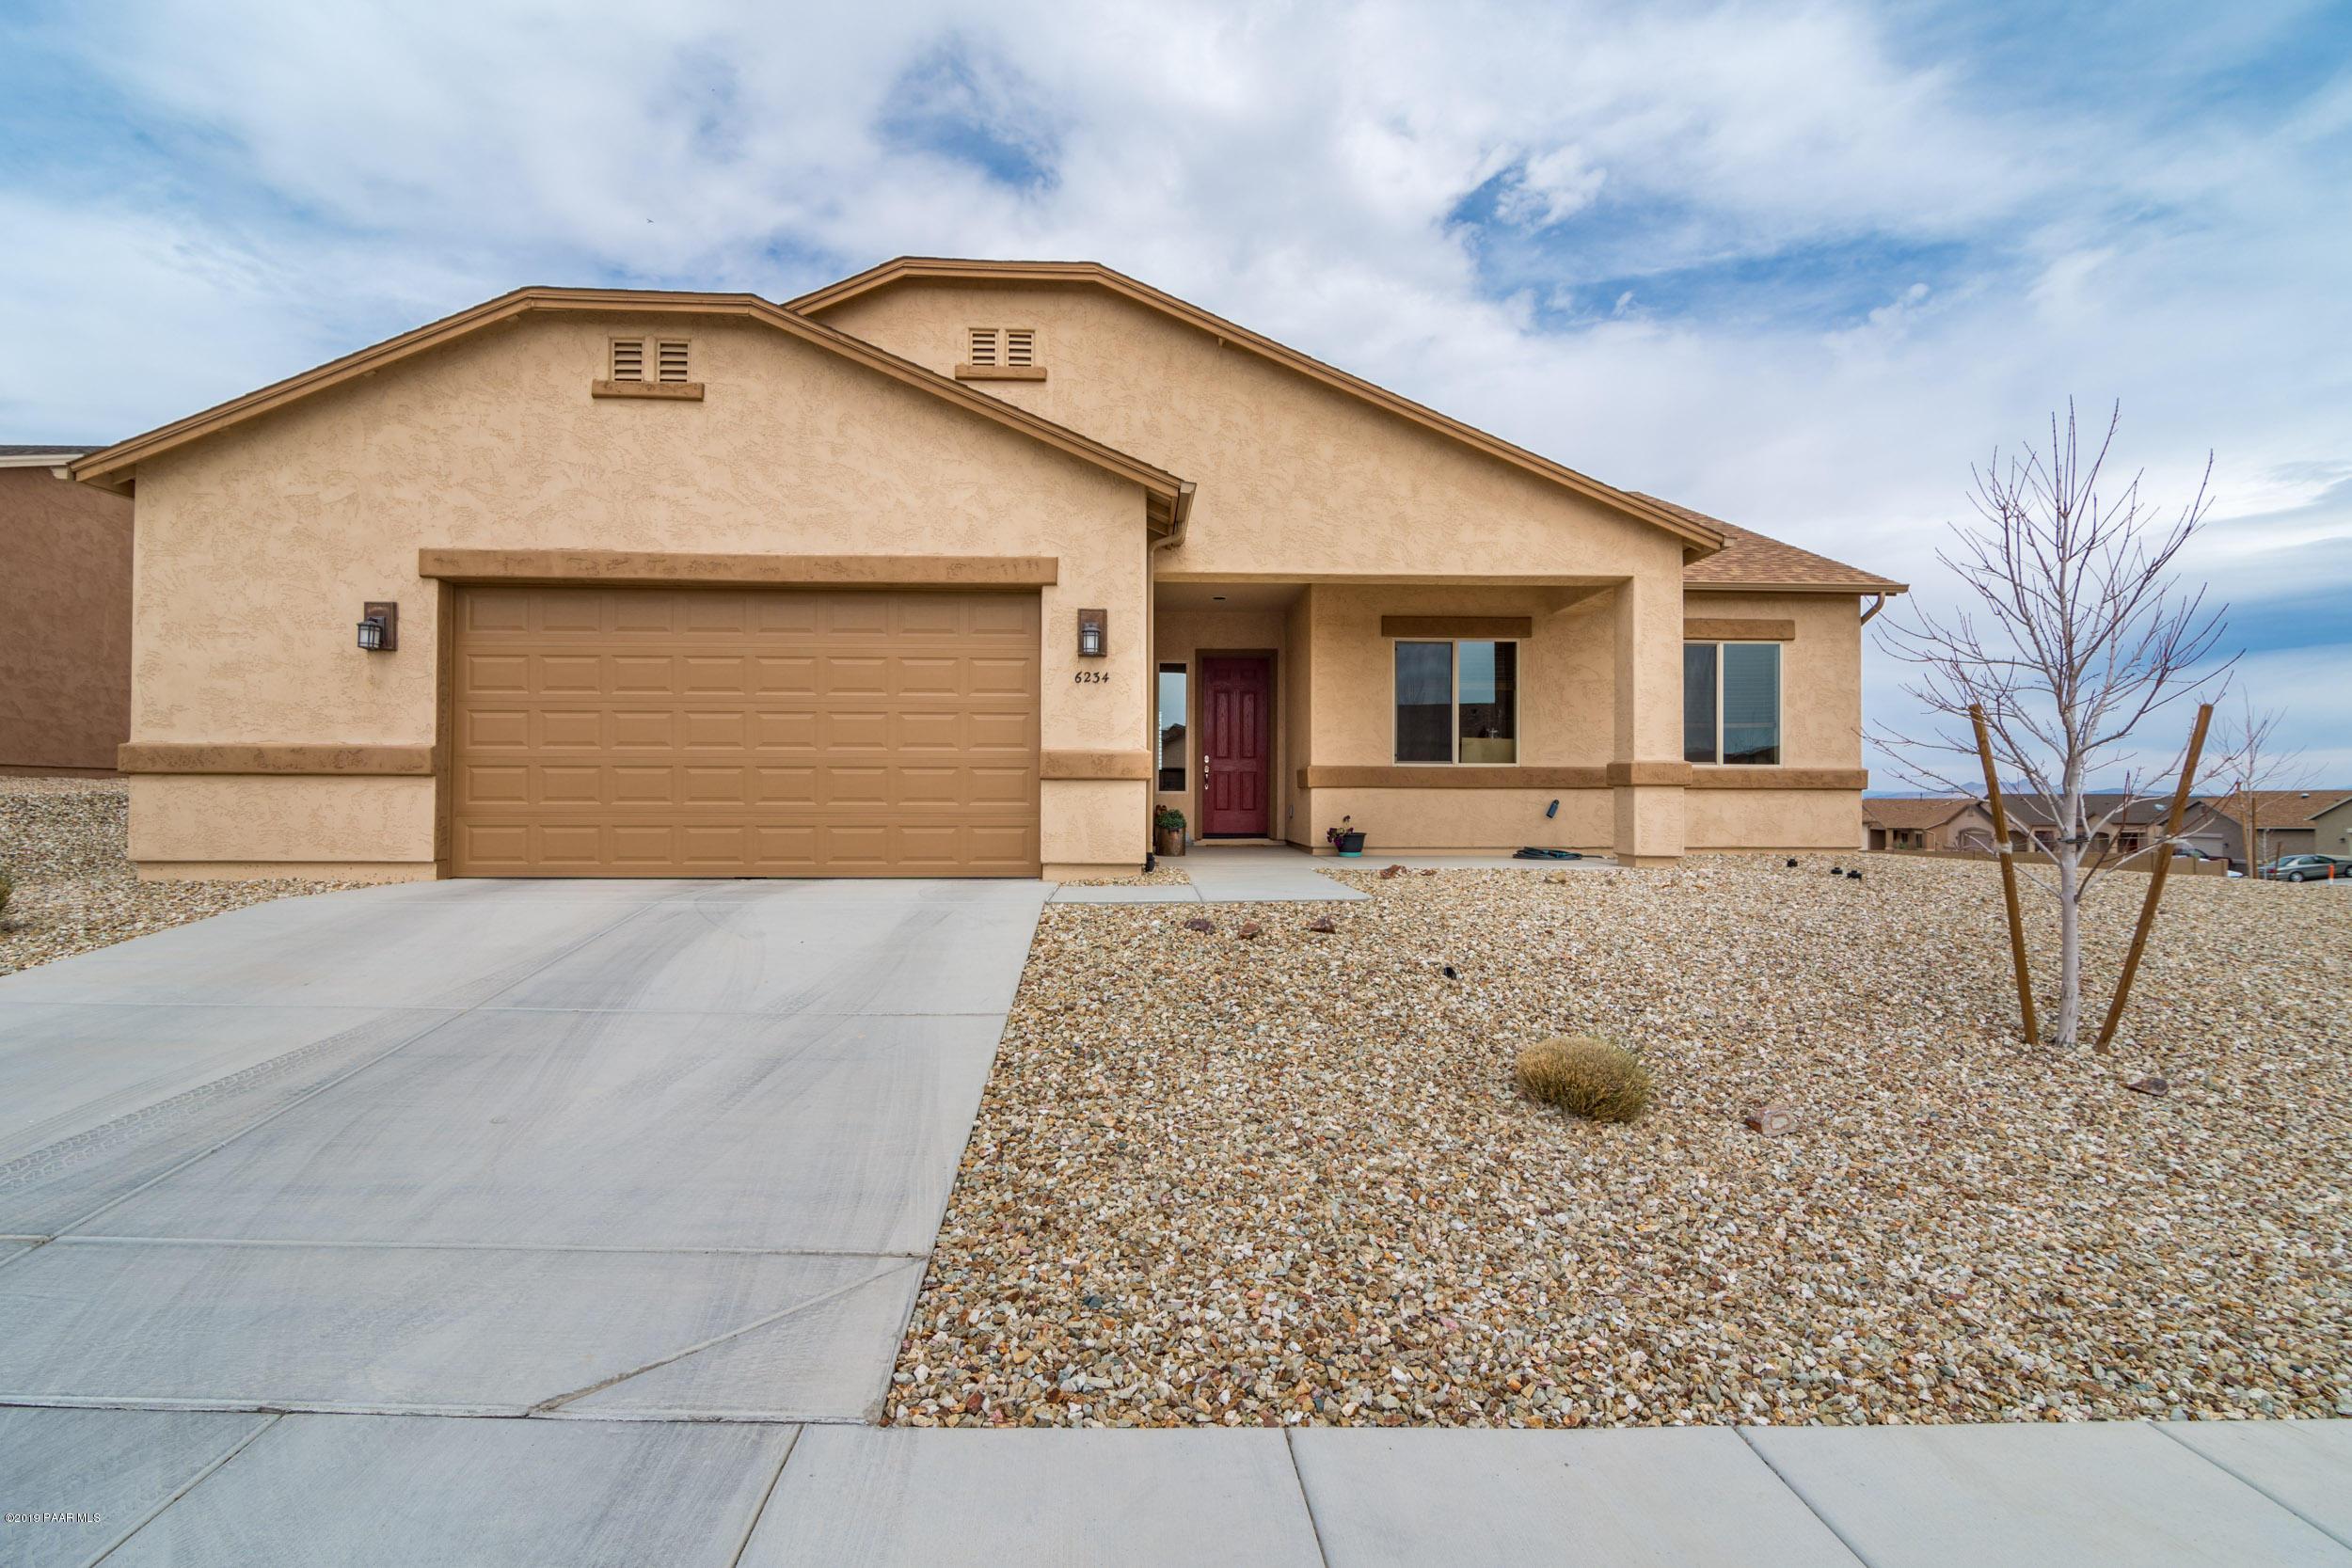 Photo of 6234 Cambridge, Prescott Valley, AZ 86314